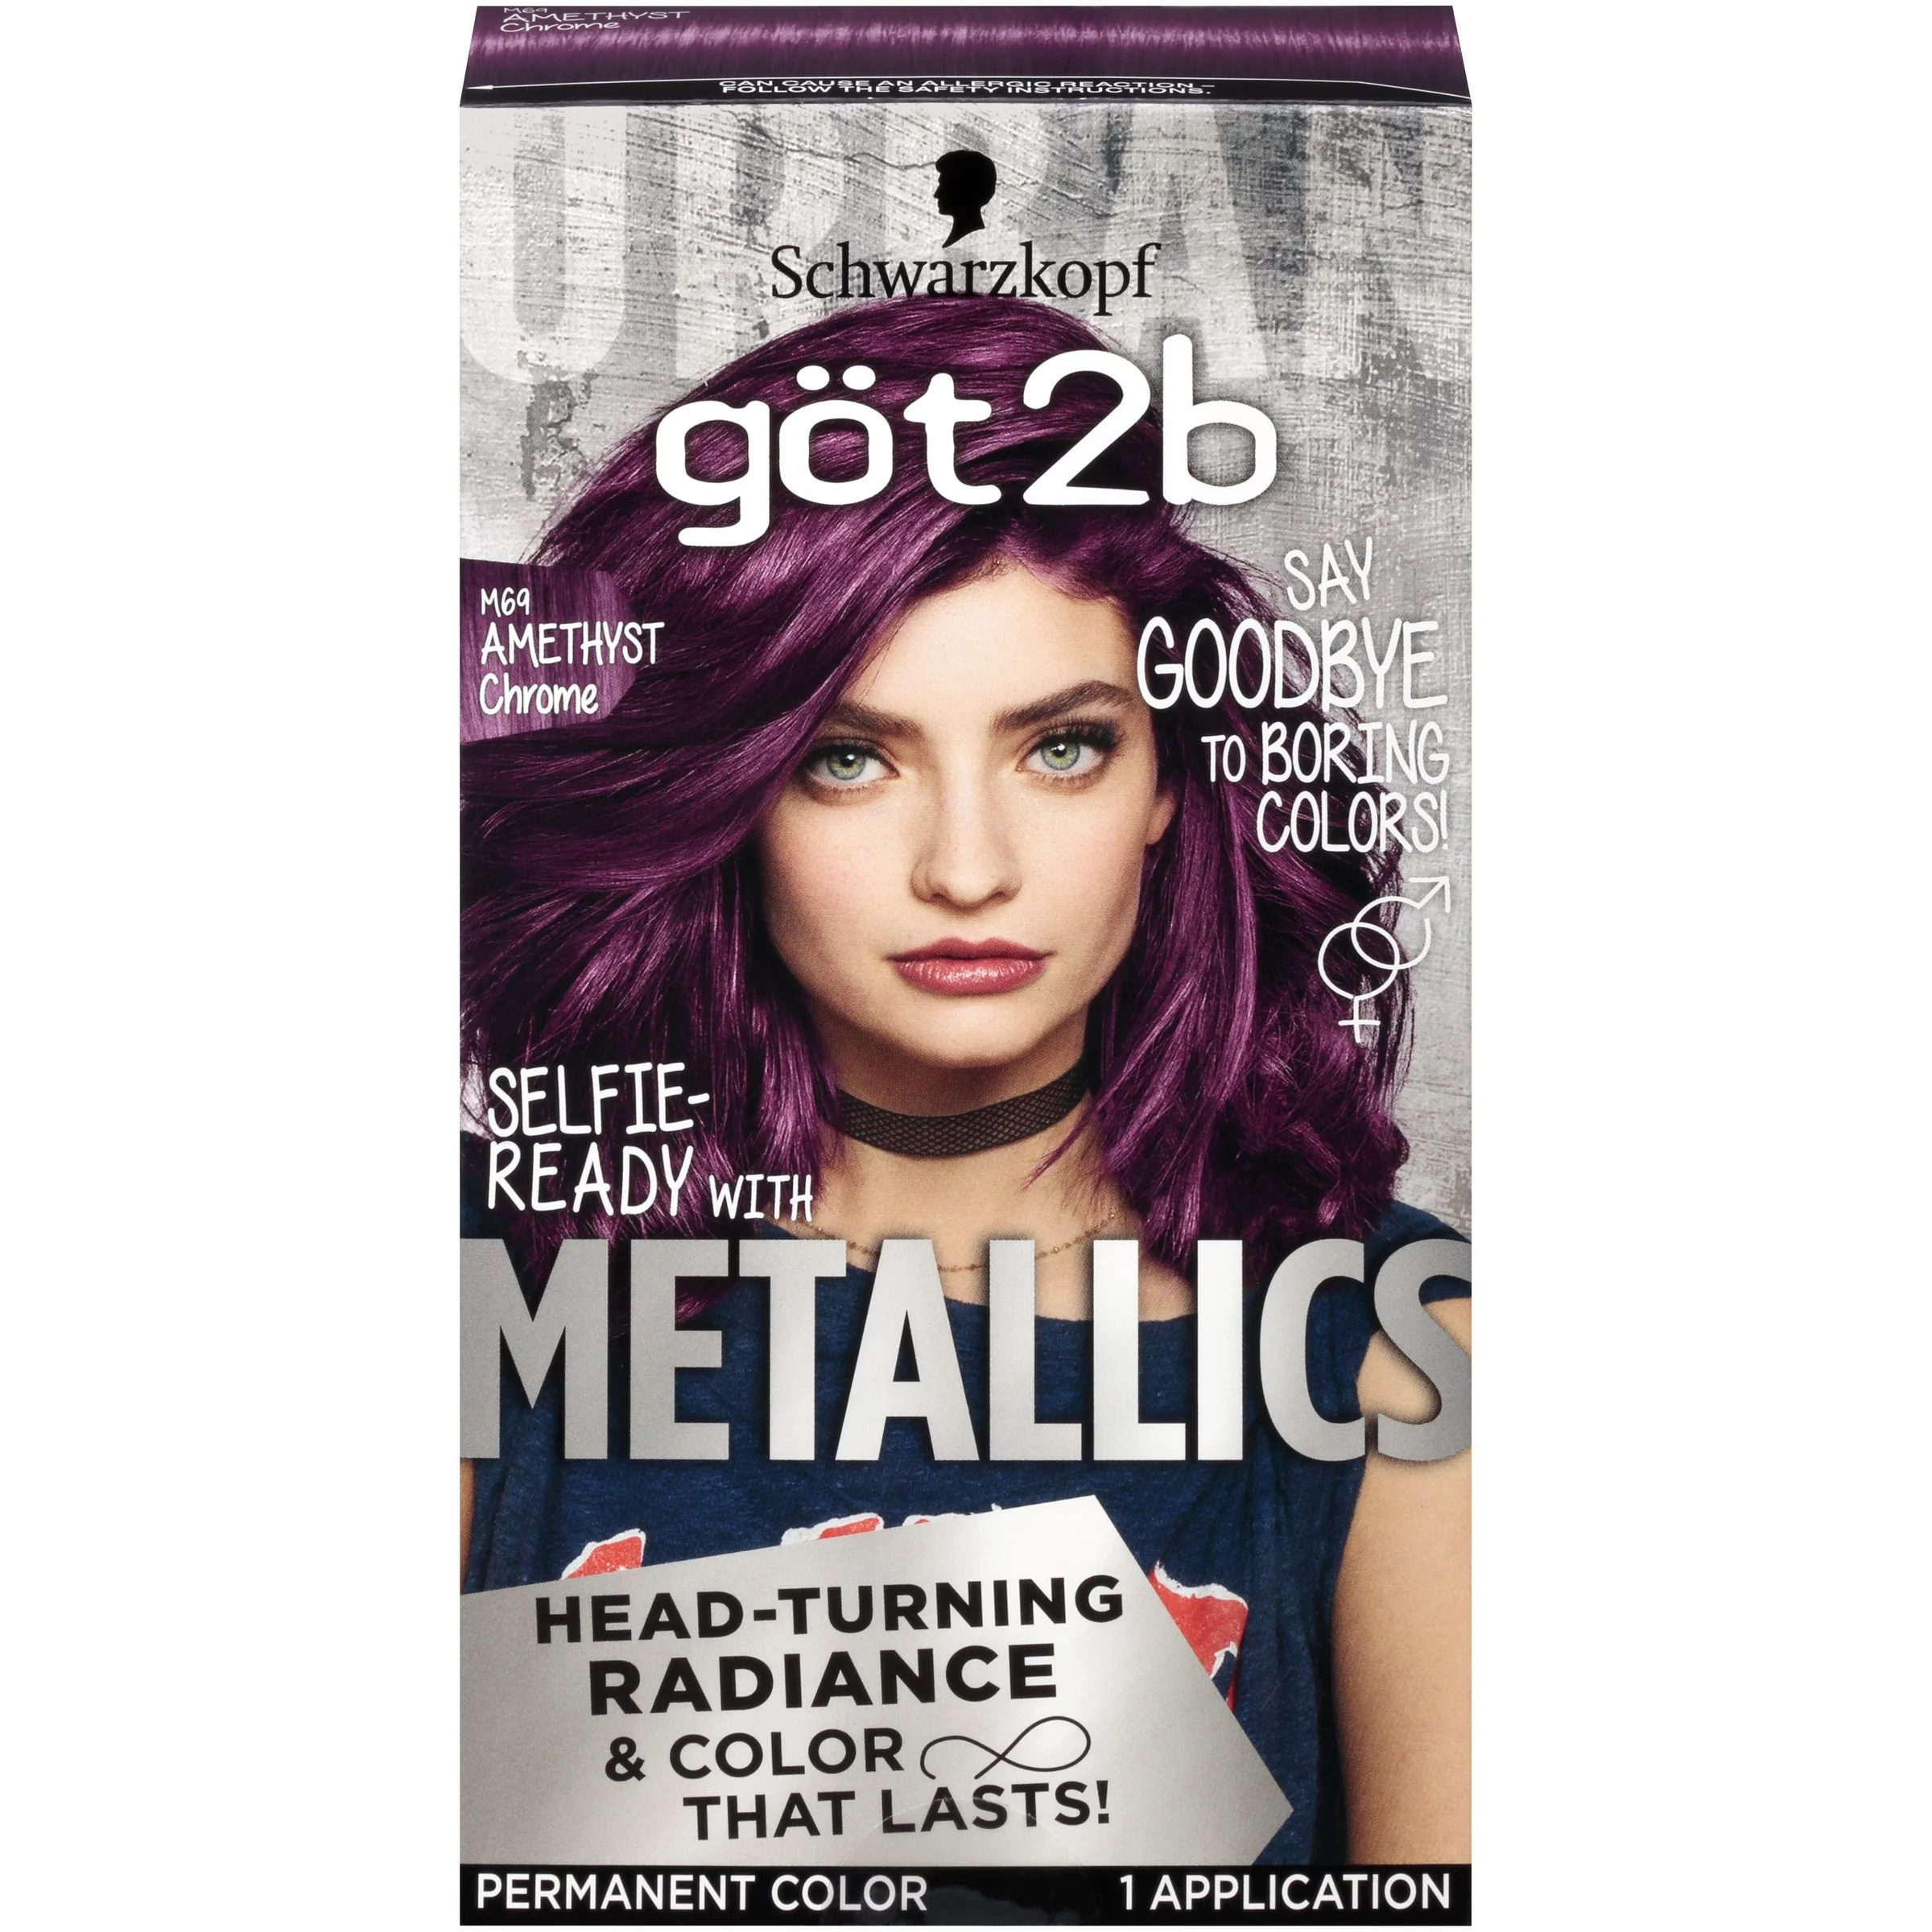 Got2b Metallic Permanent Hair Color M69 Amethyst Chrome